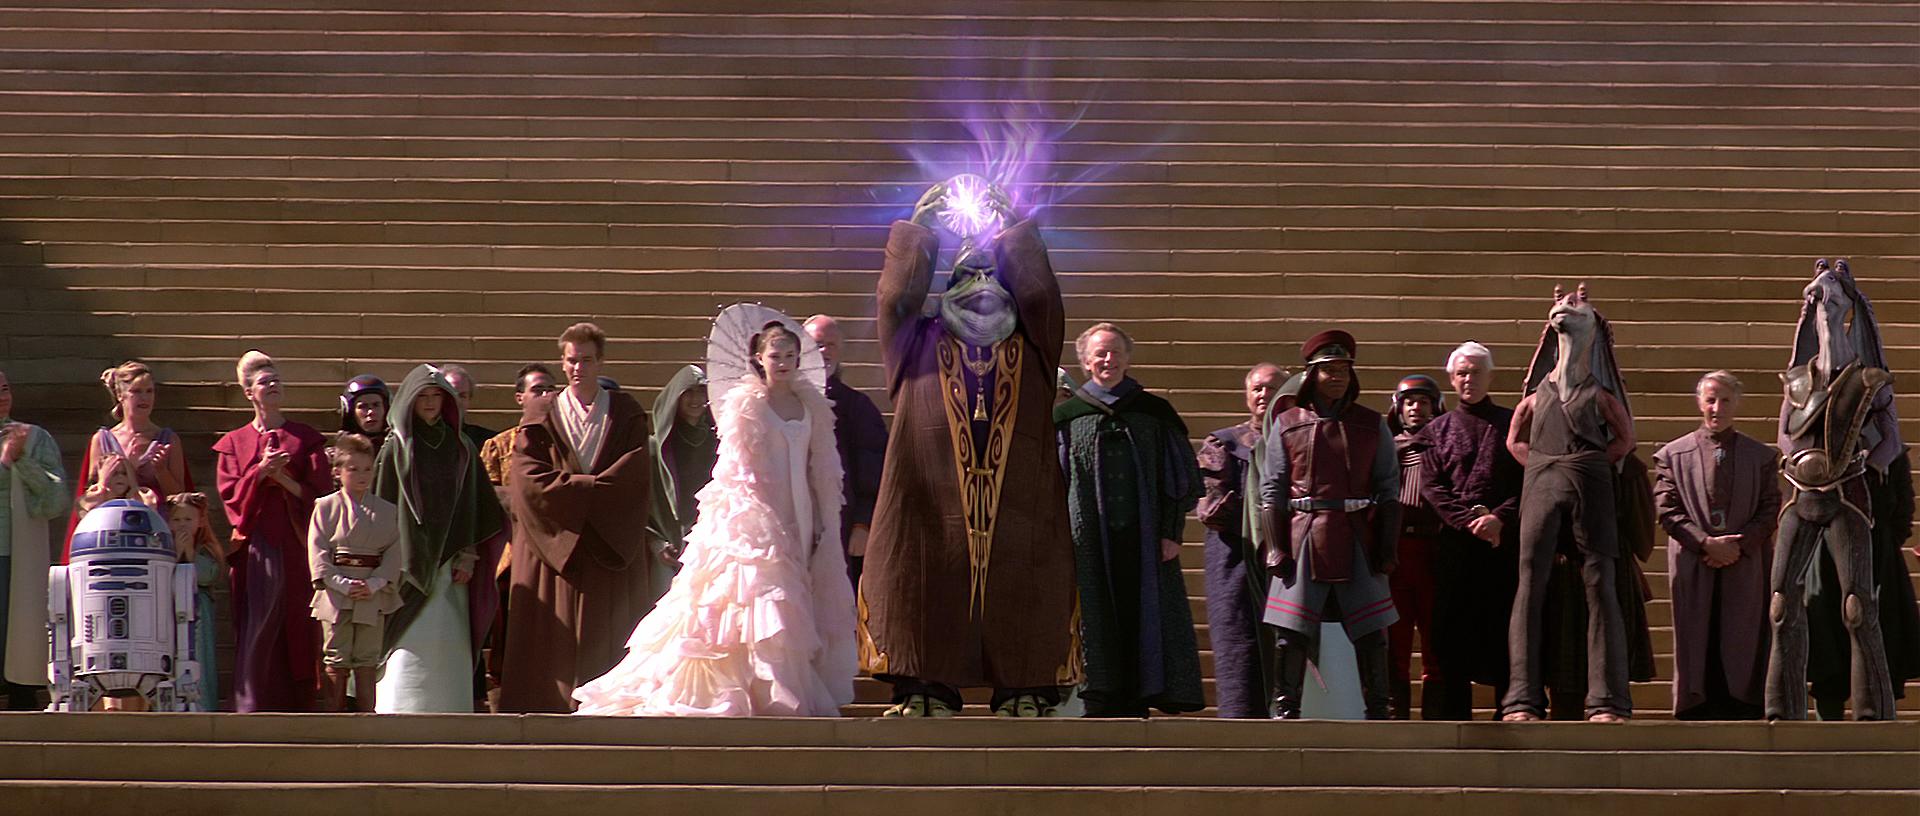 Peace - Star Wars The Phantom Menace